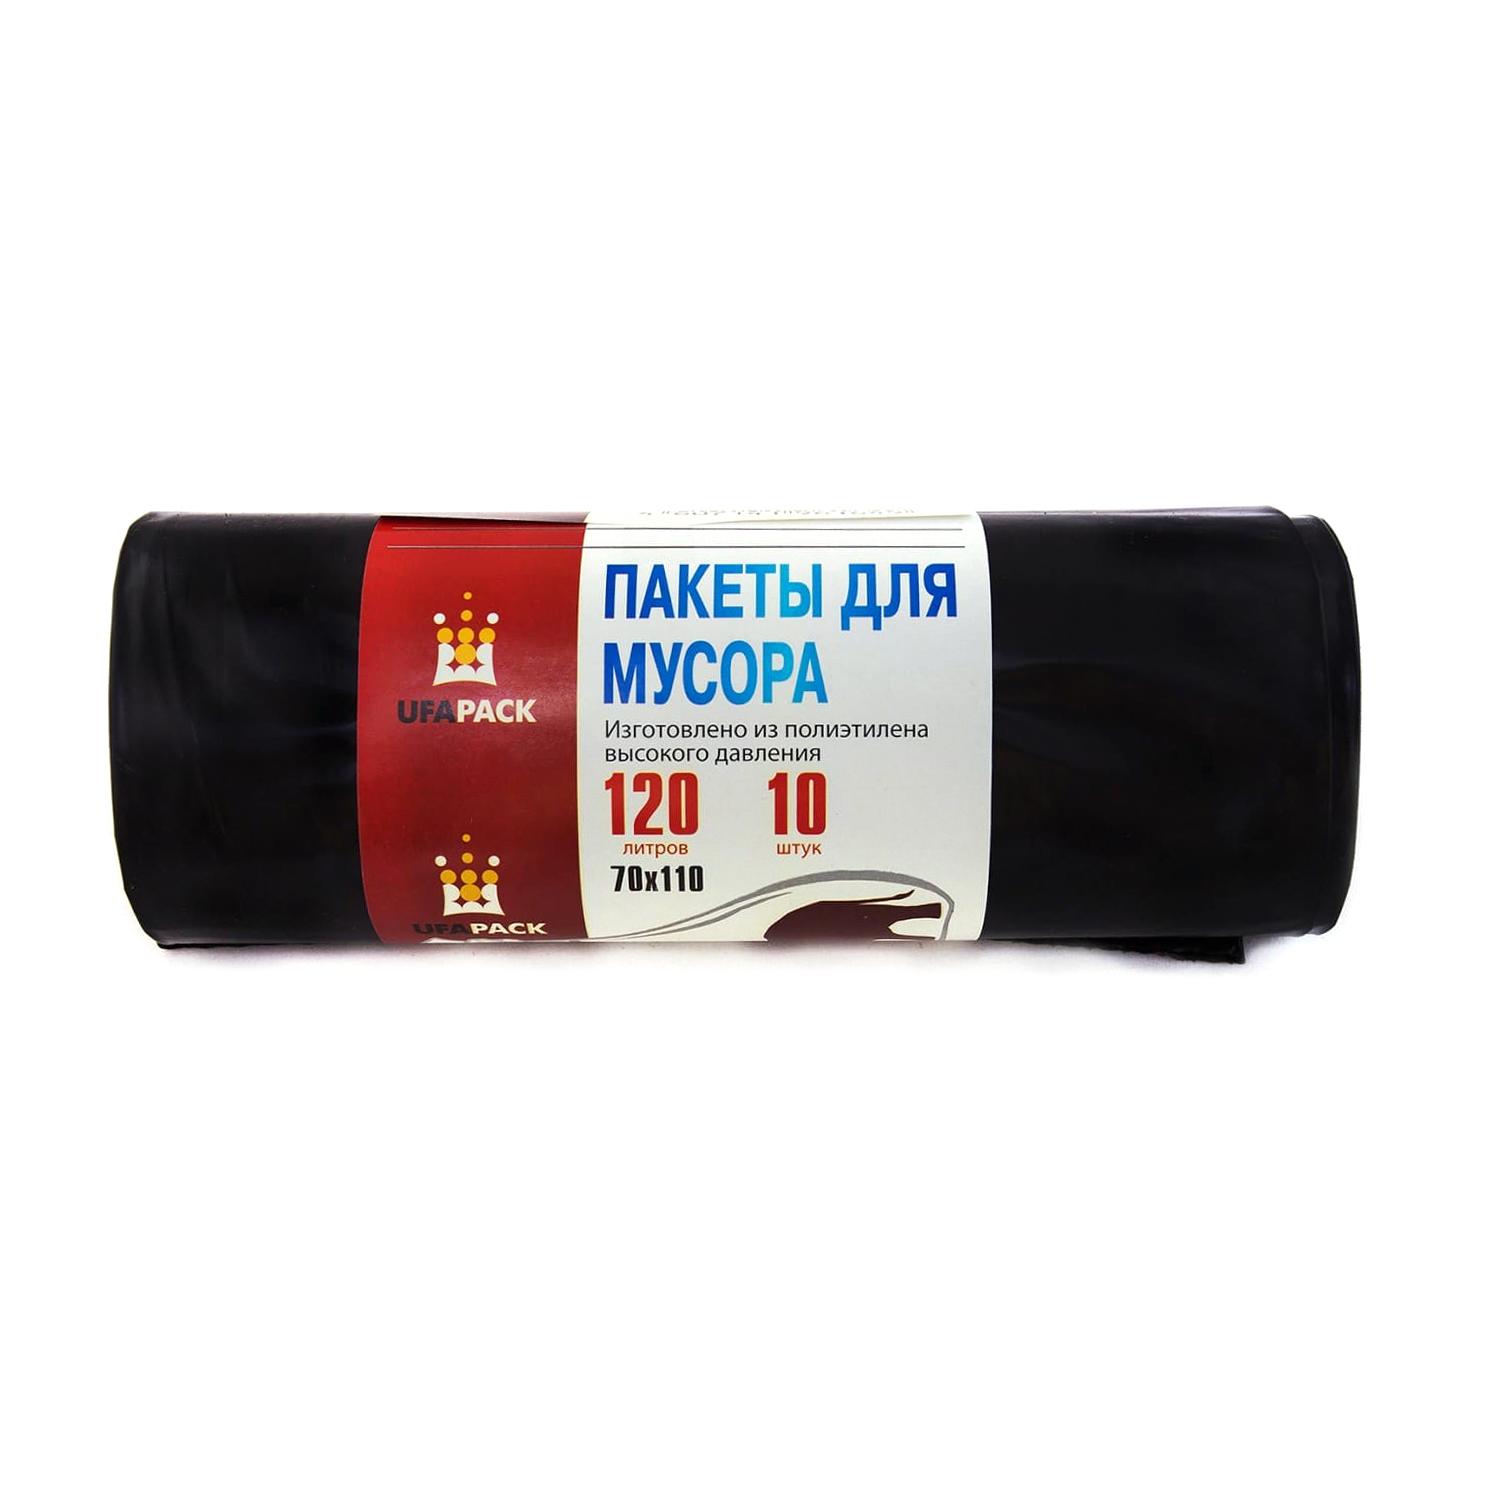 Мешки для мусора UFAPACK черные 120 л 10 шт мешки для мусора ufapack с ушками черные 35 л 30 шт